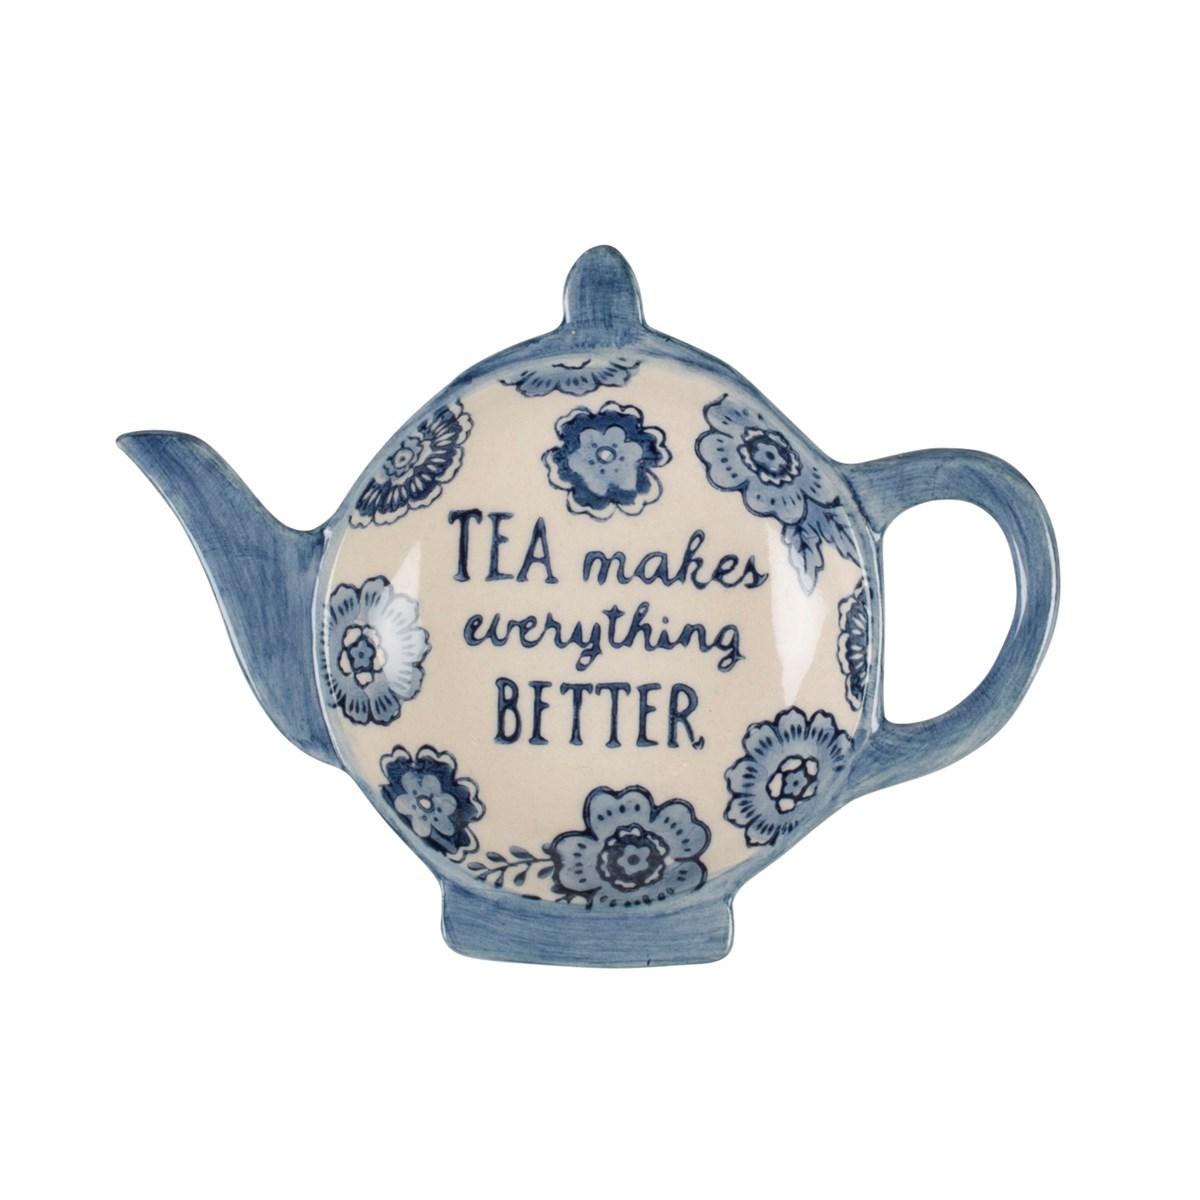 Kitchen Tea Accessories: Blue Floral Tea Lovers Tea Bag Dish